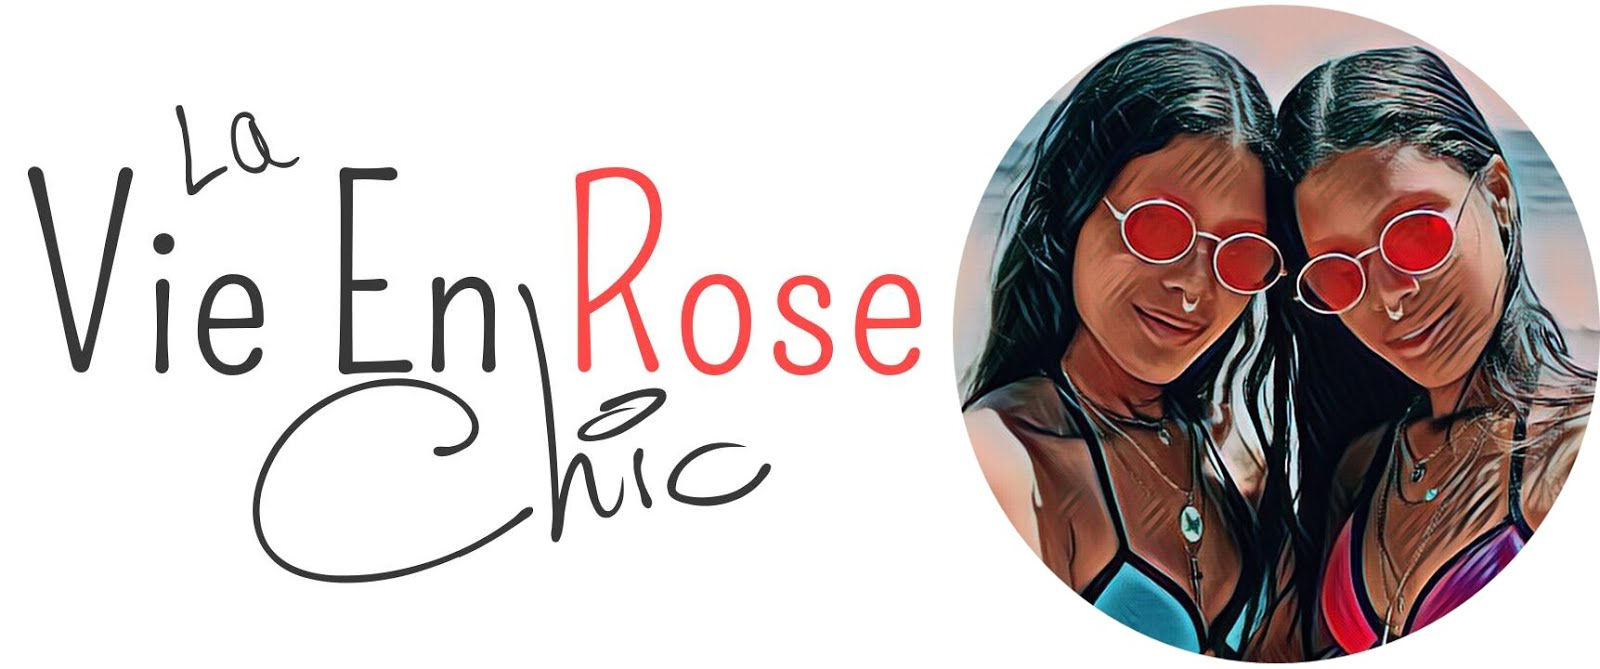 La Vie en Rose Chic